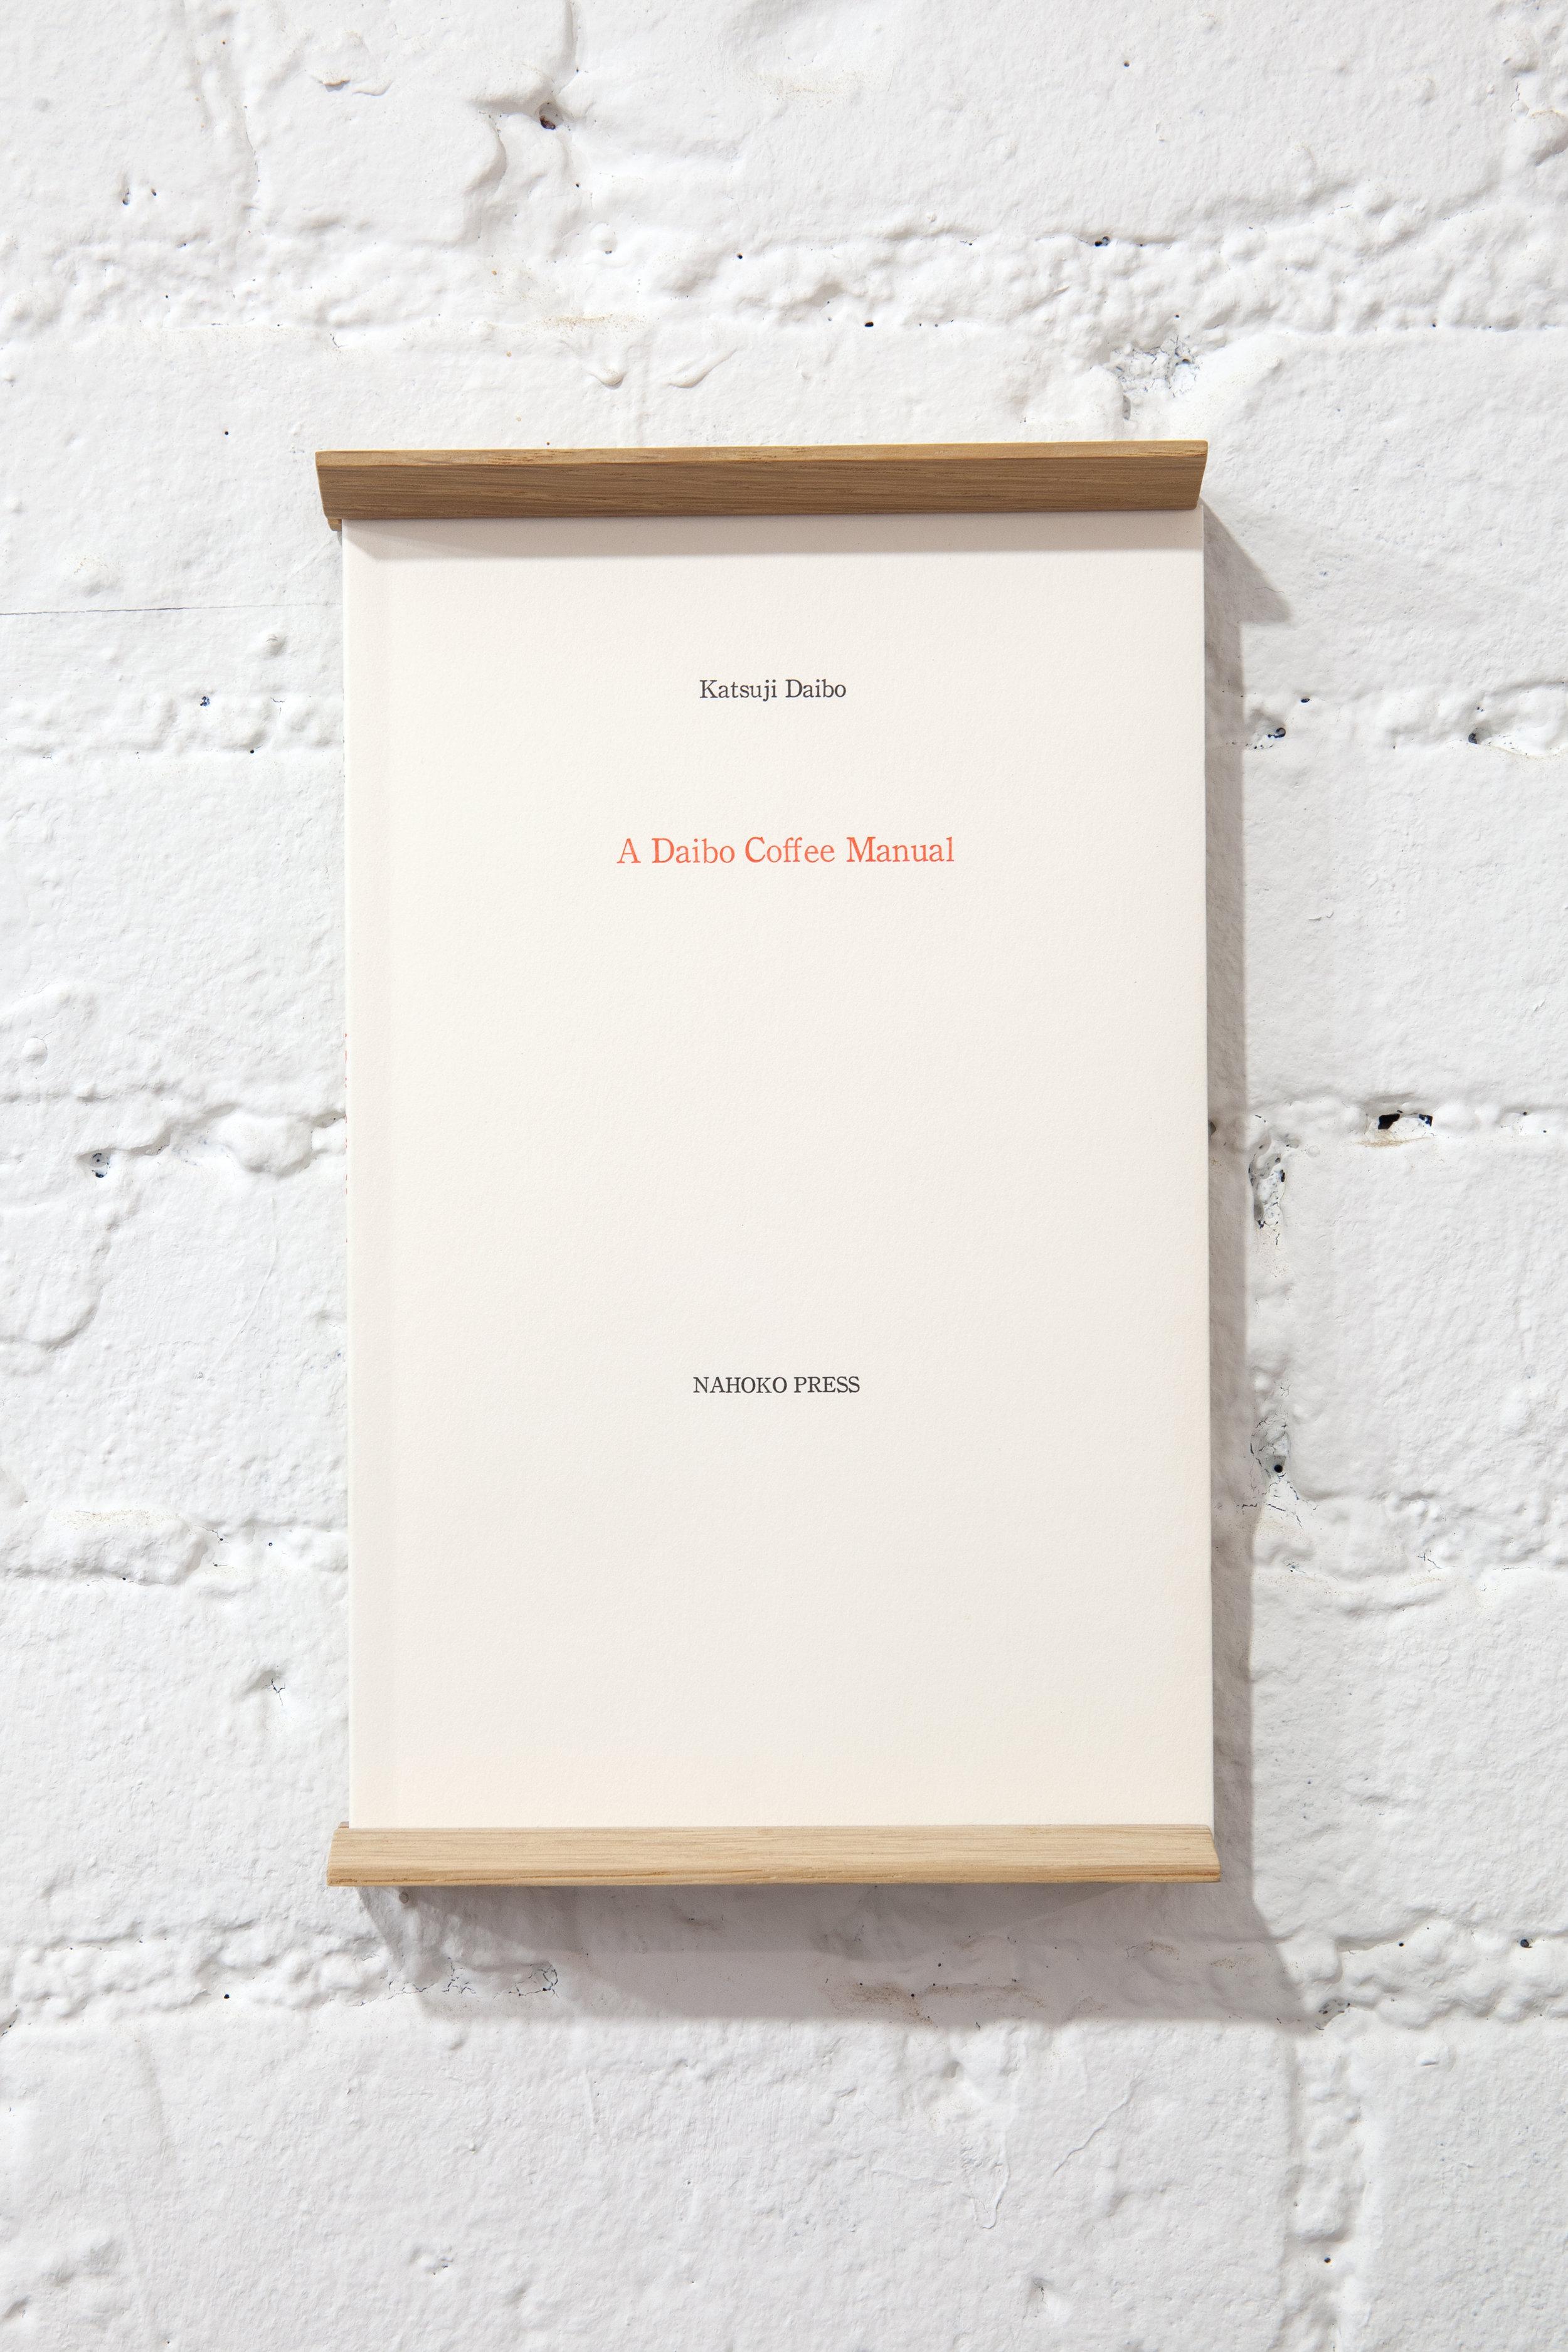 Nahoko Press  A Daibo Coffee Manual  Letter-press book